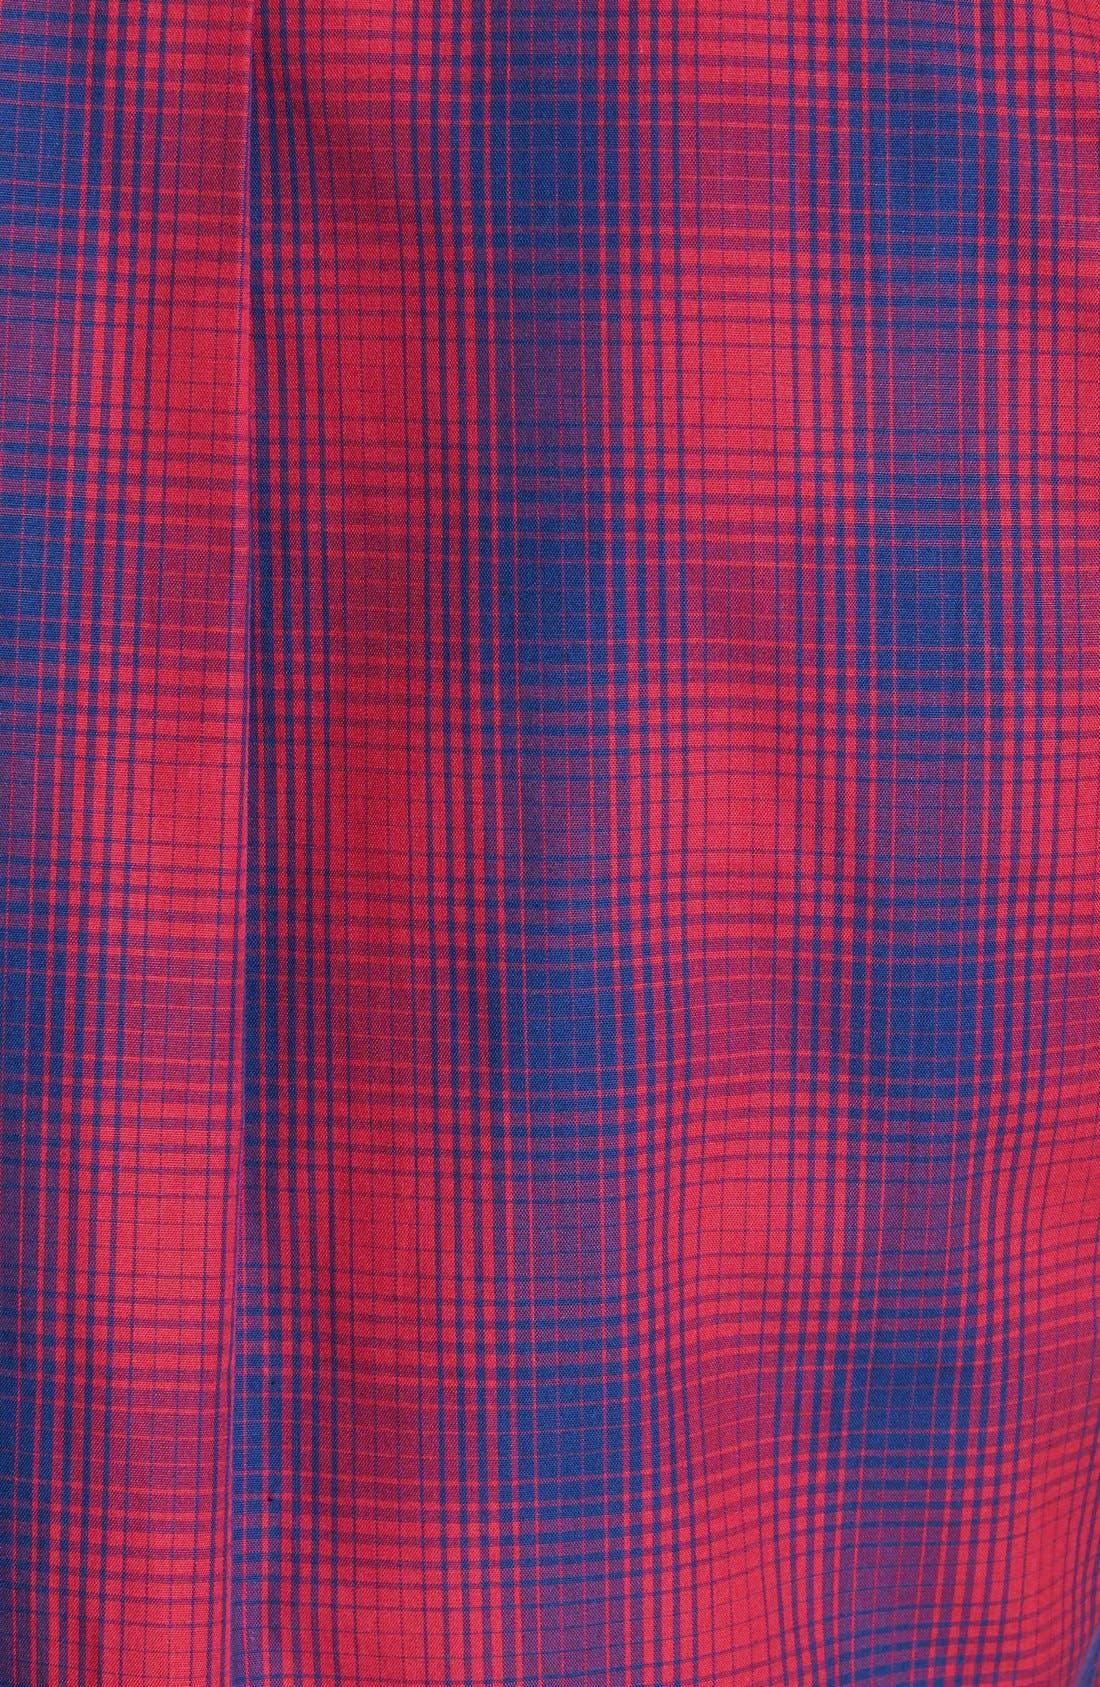 Alternate Image 2  - Descendant of Thieves Ombré Short Sleeve Plaid Shirt